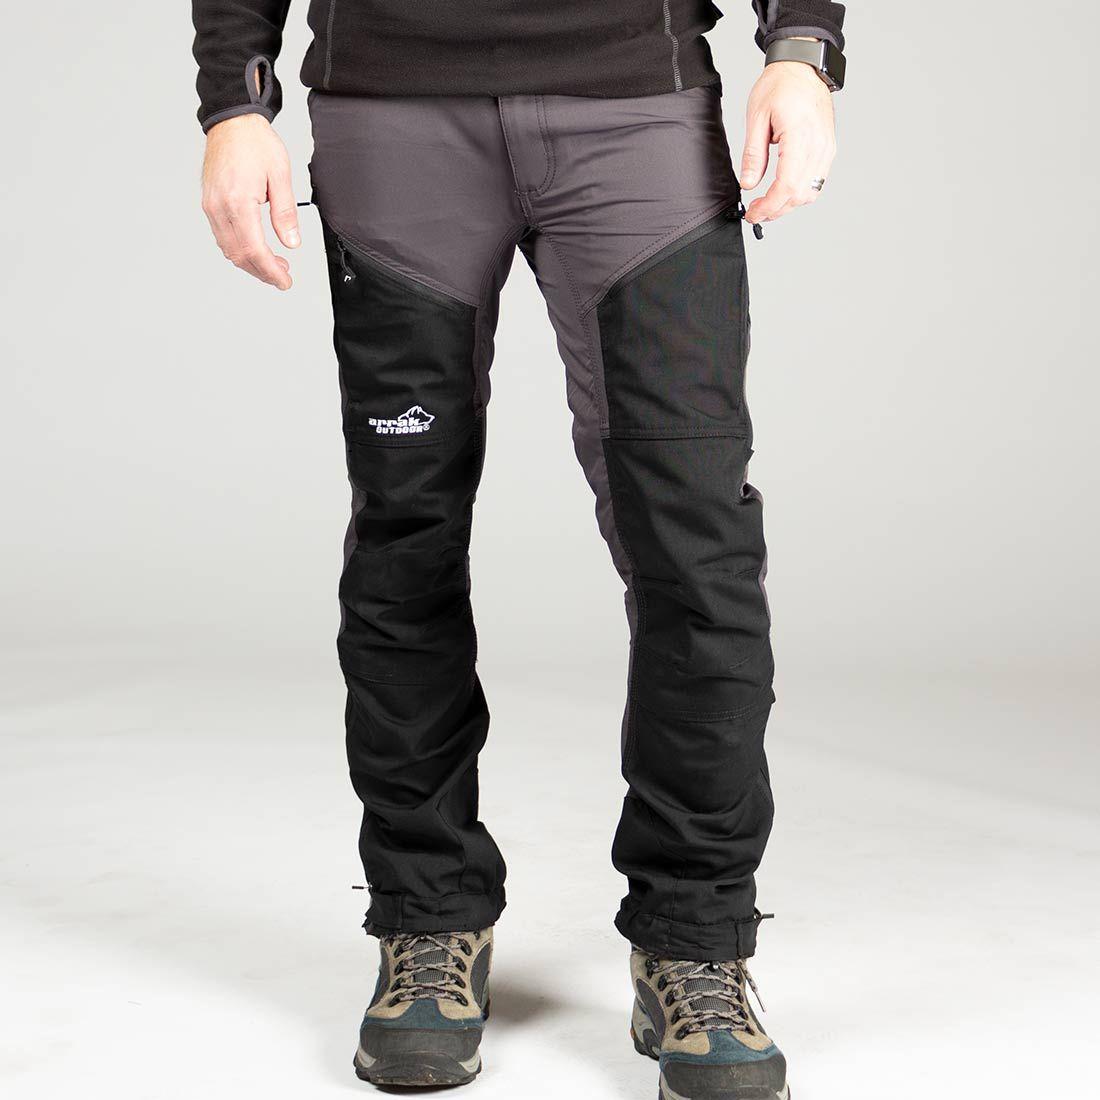 Arrak Rough Pant, Dark Grey 58